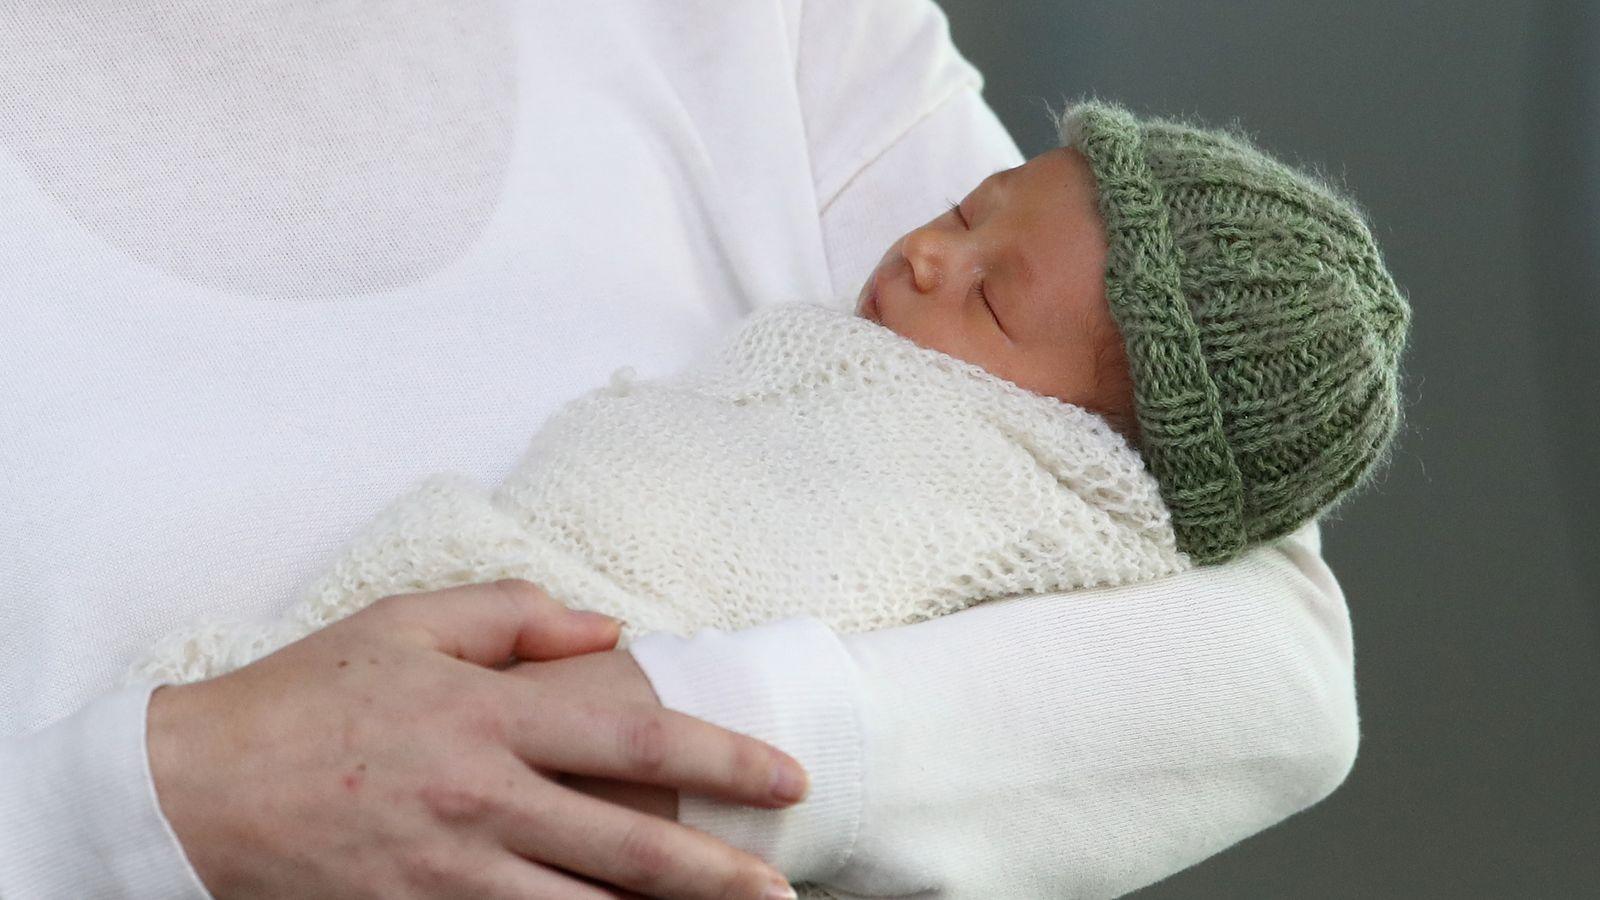 NZ prime minister Jacinda Ardern reveals new baby Neve